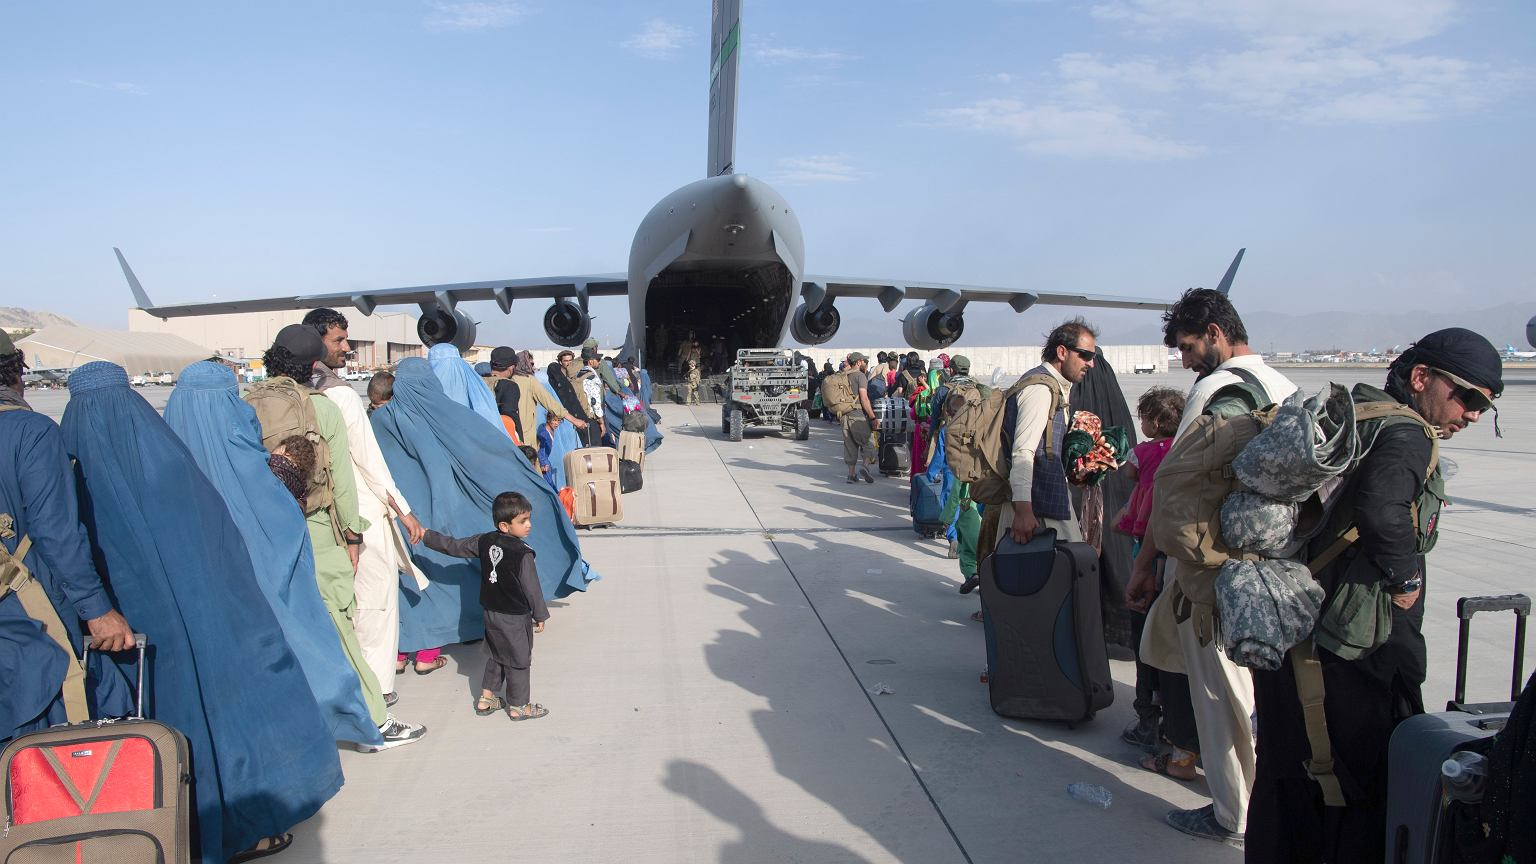 US Embassy in Kabul.  Americans should avoid Kabul airport